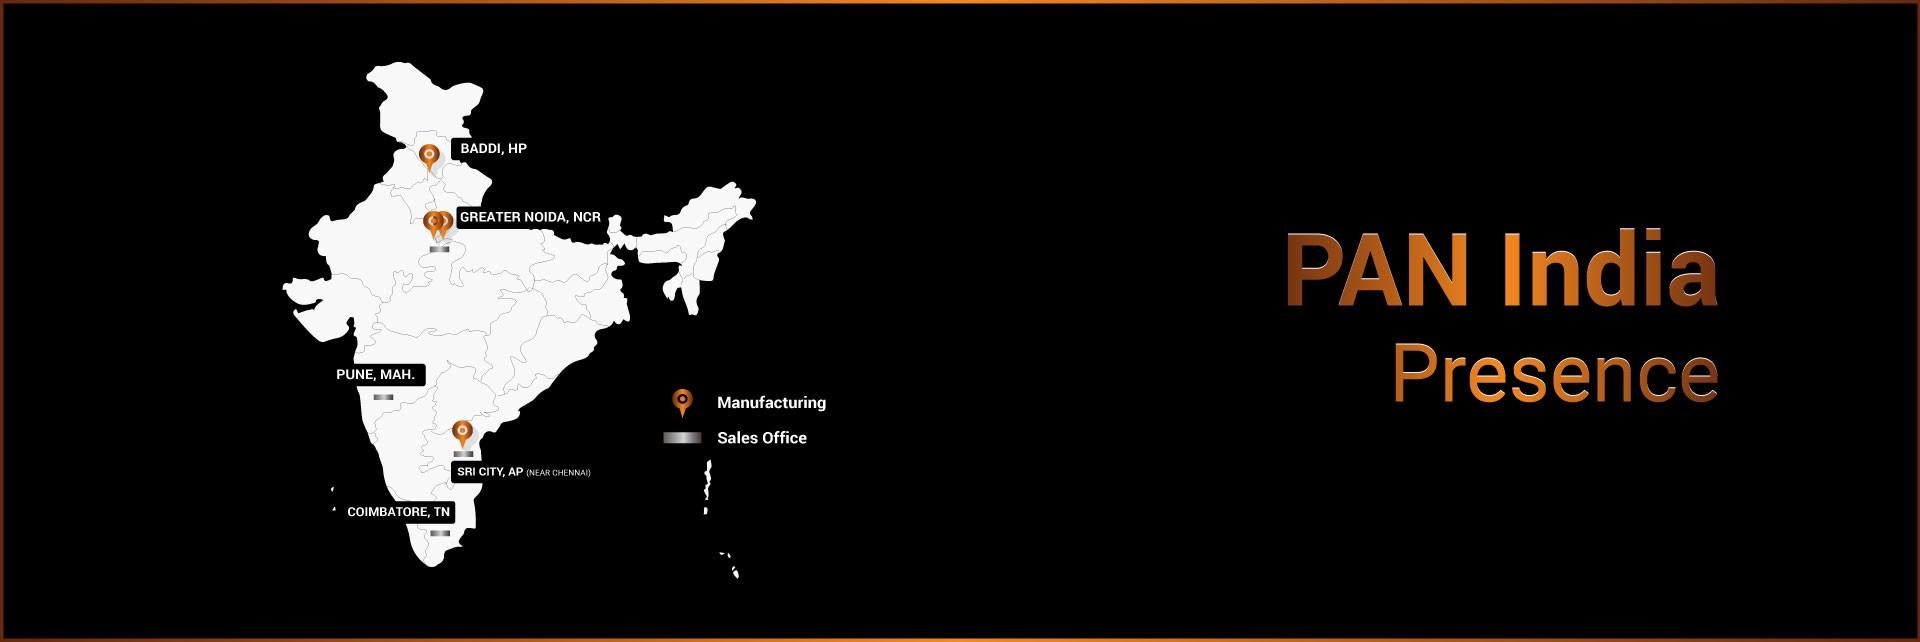 Pan-India-Presence of Geekay